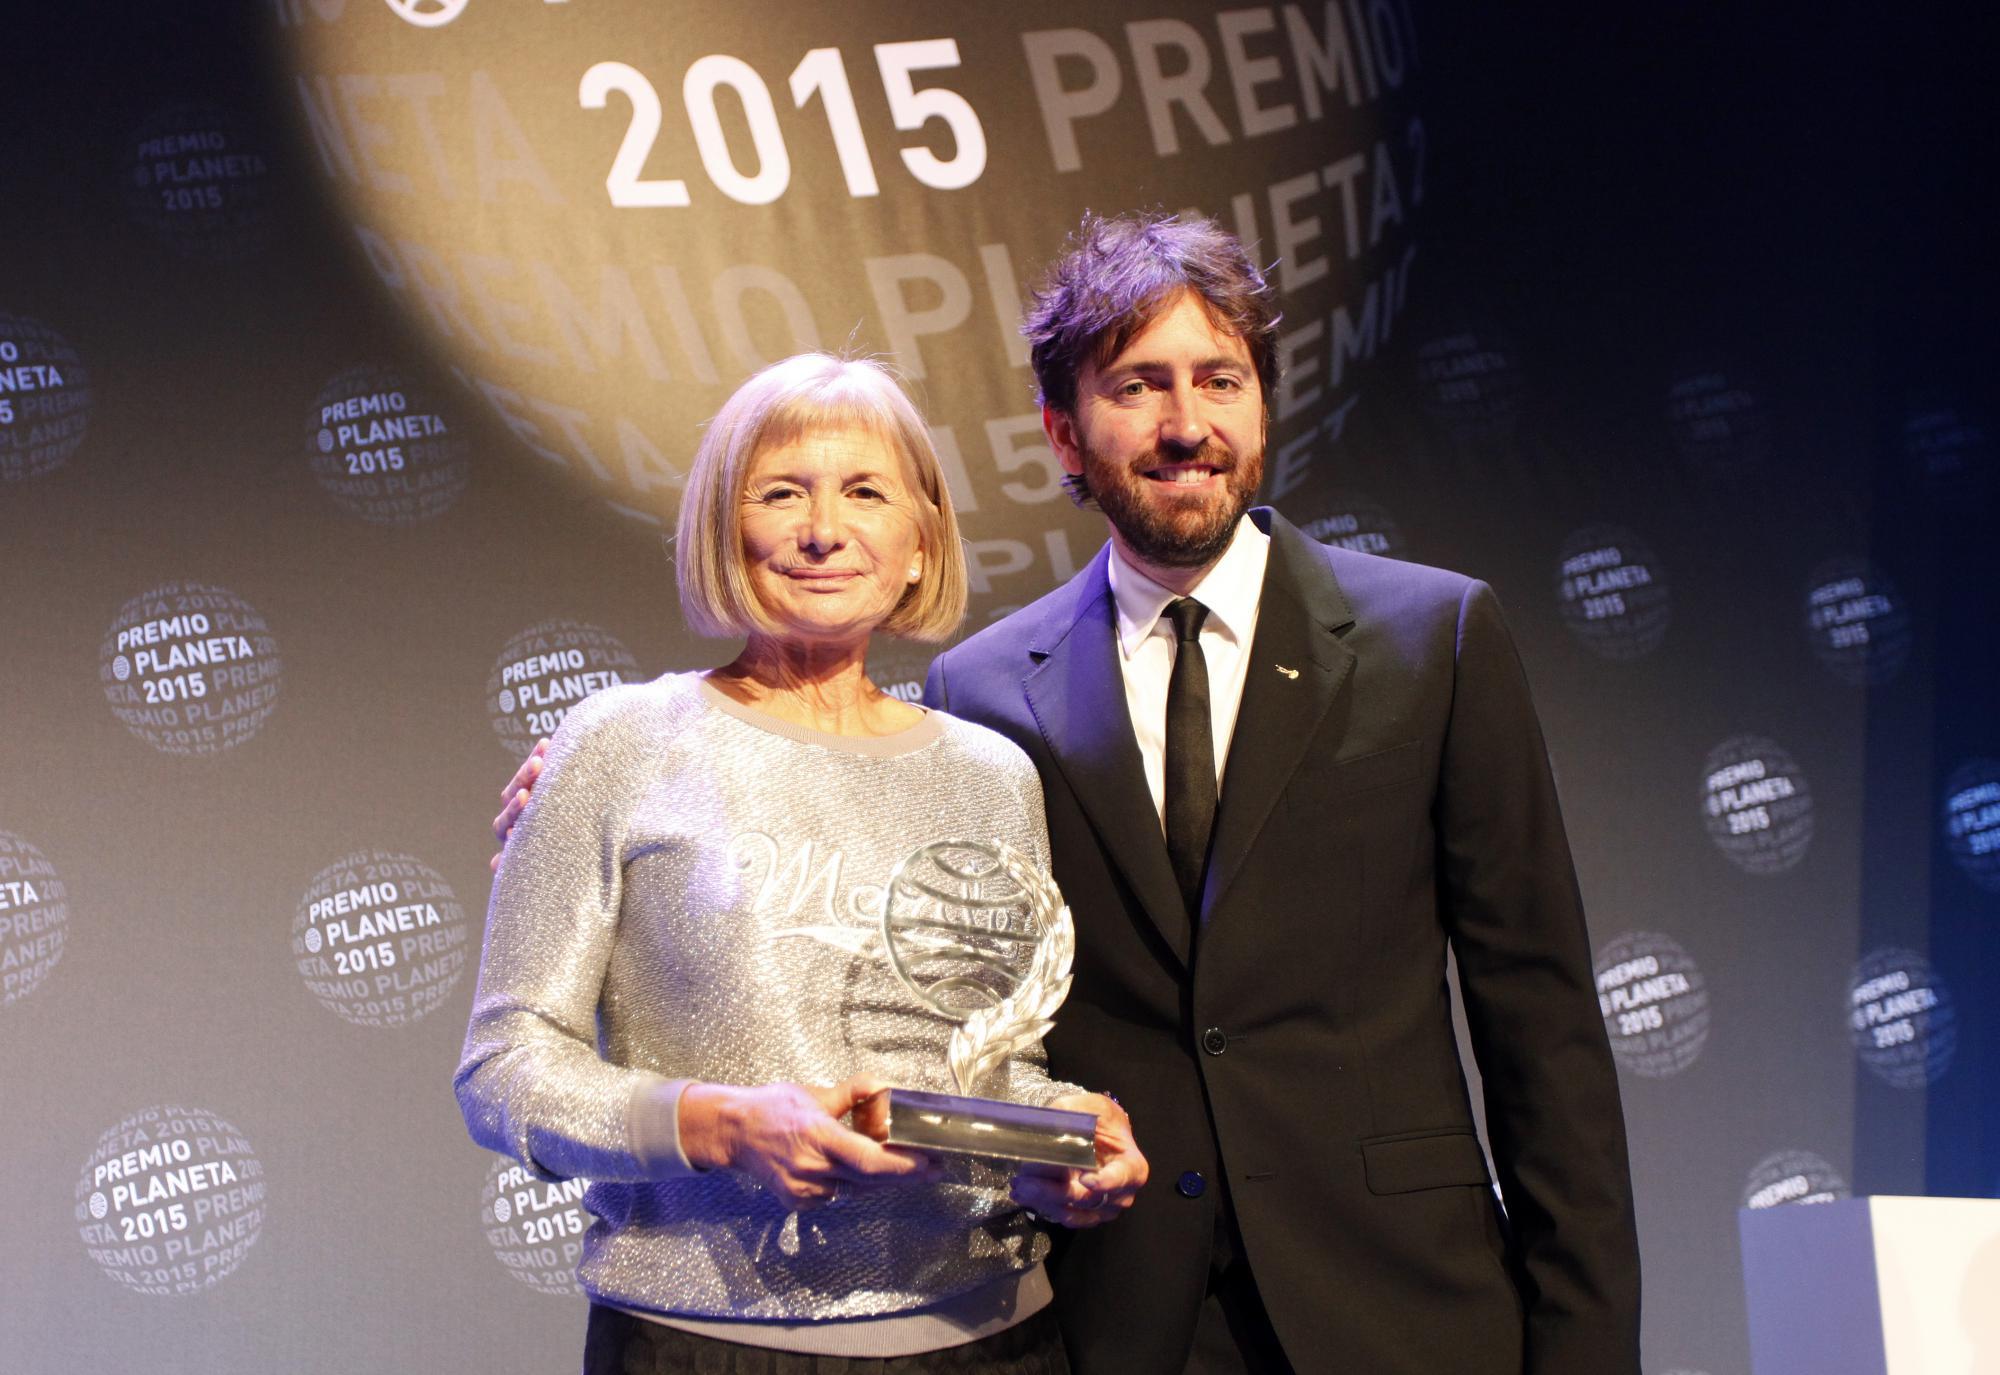 Alicia Giménez Bartlett, Premio Planeta 2015, y Daniel Sánchez Arévalo, finalista